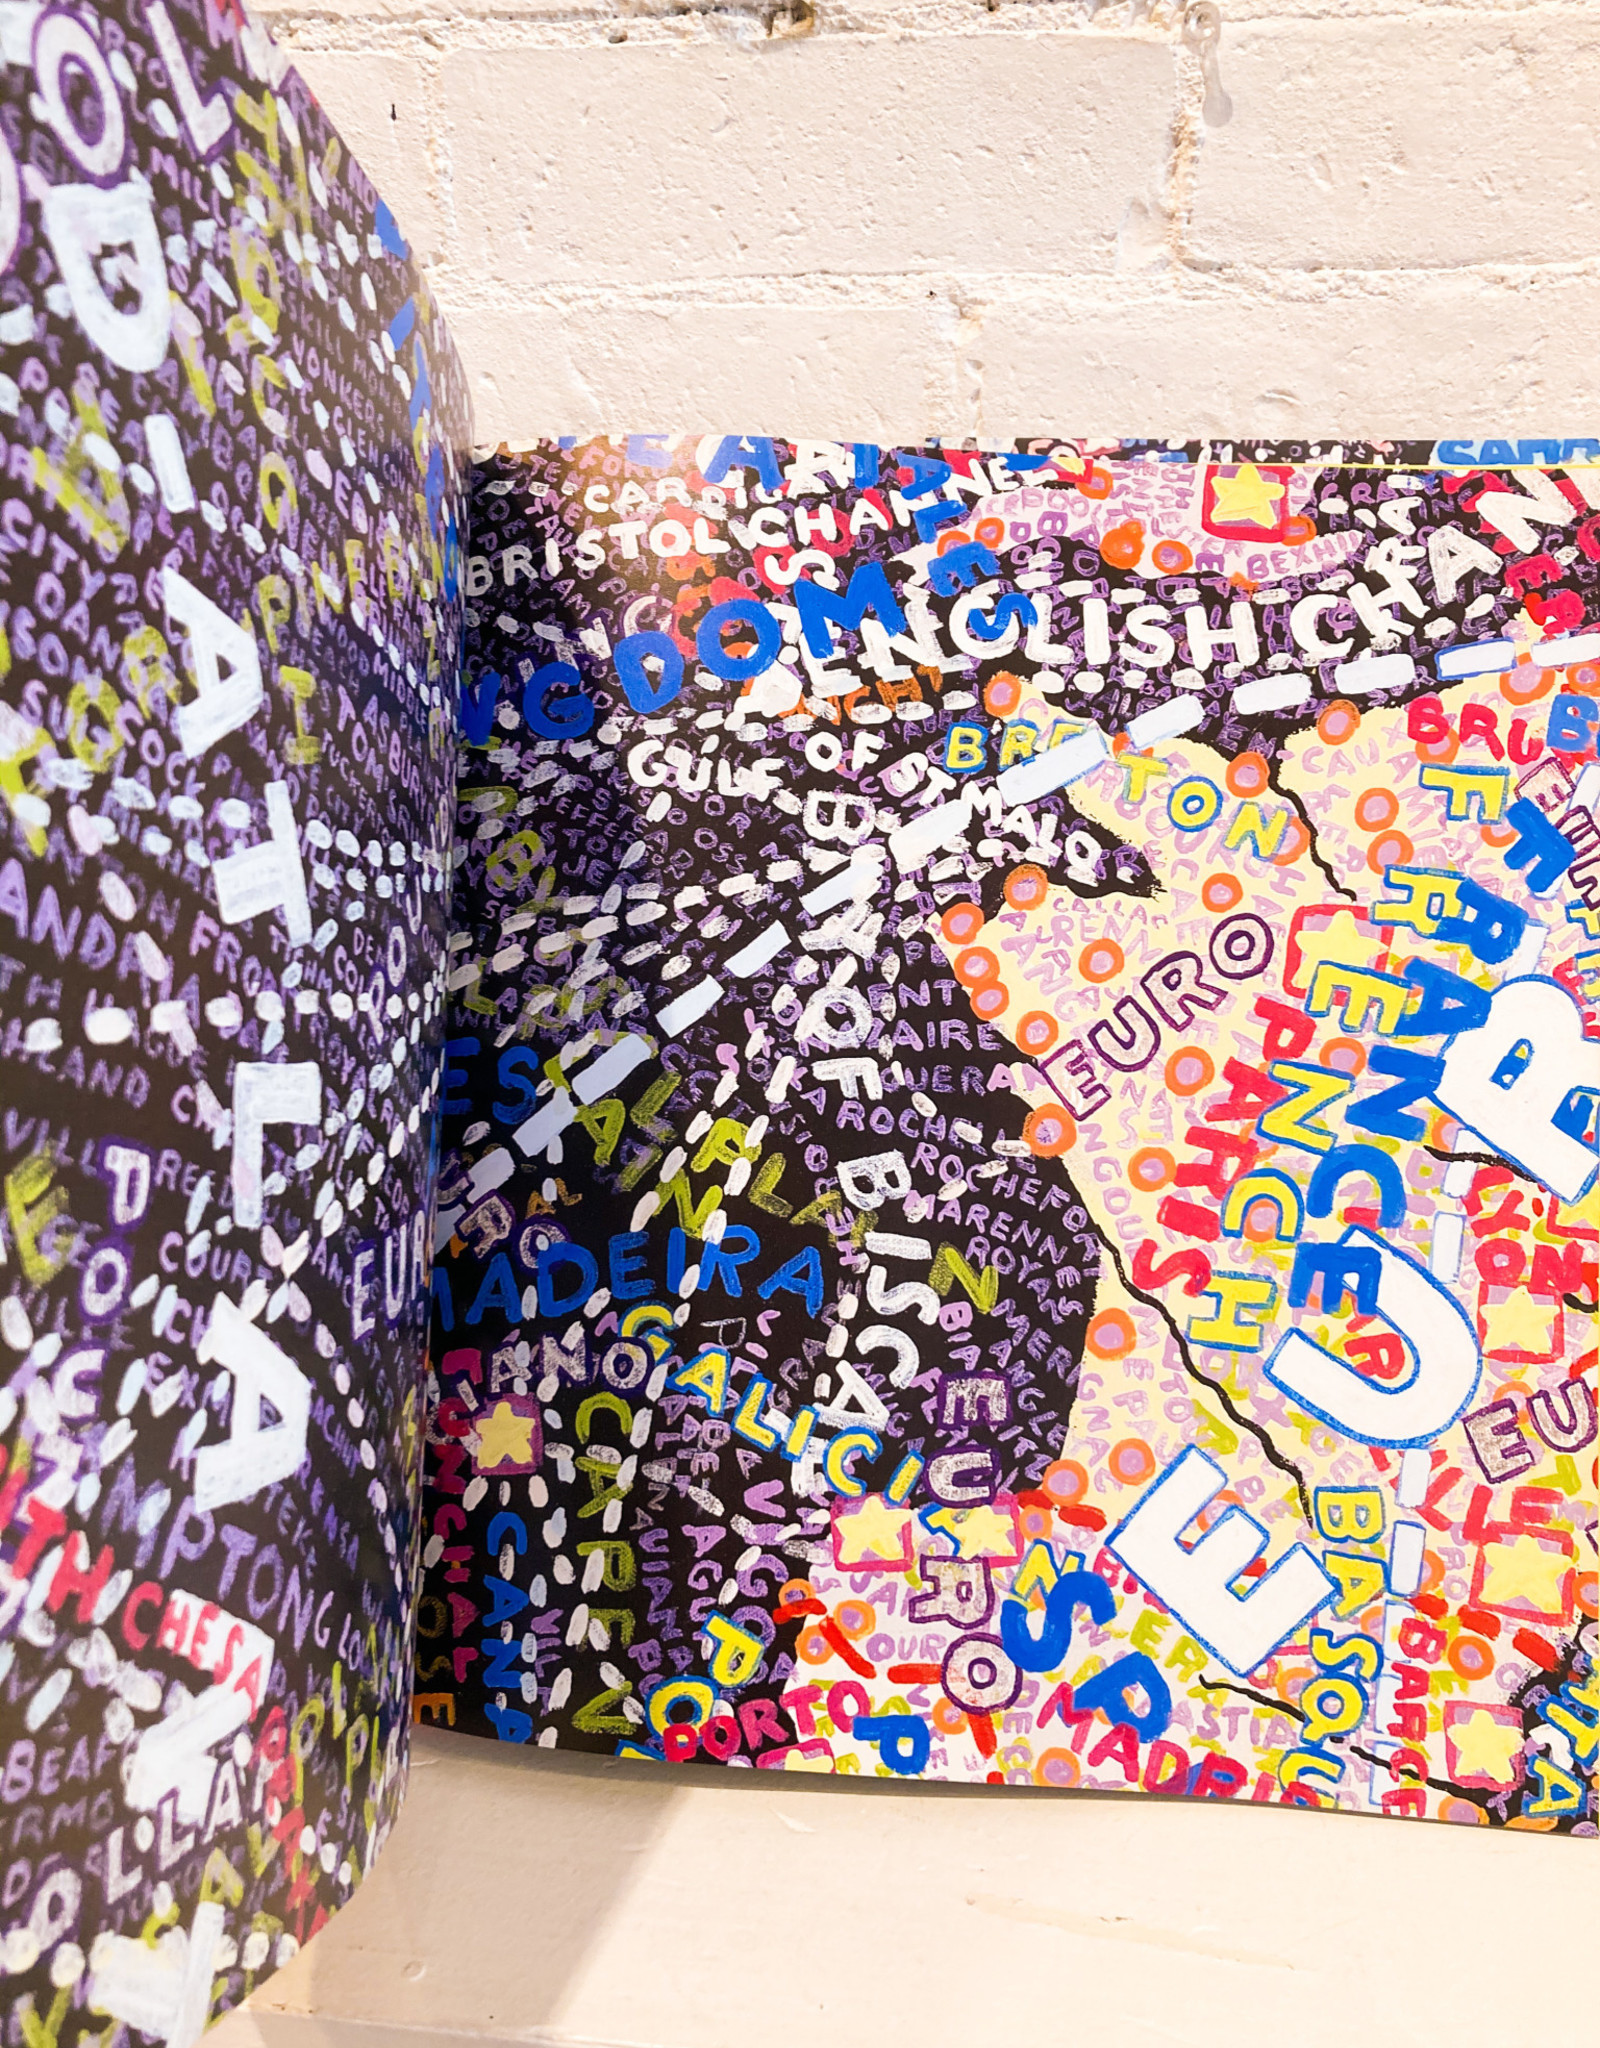 Maps by Paula Scher